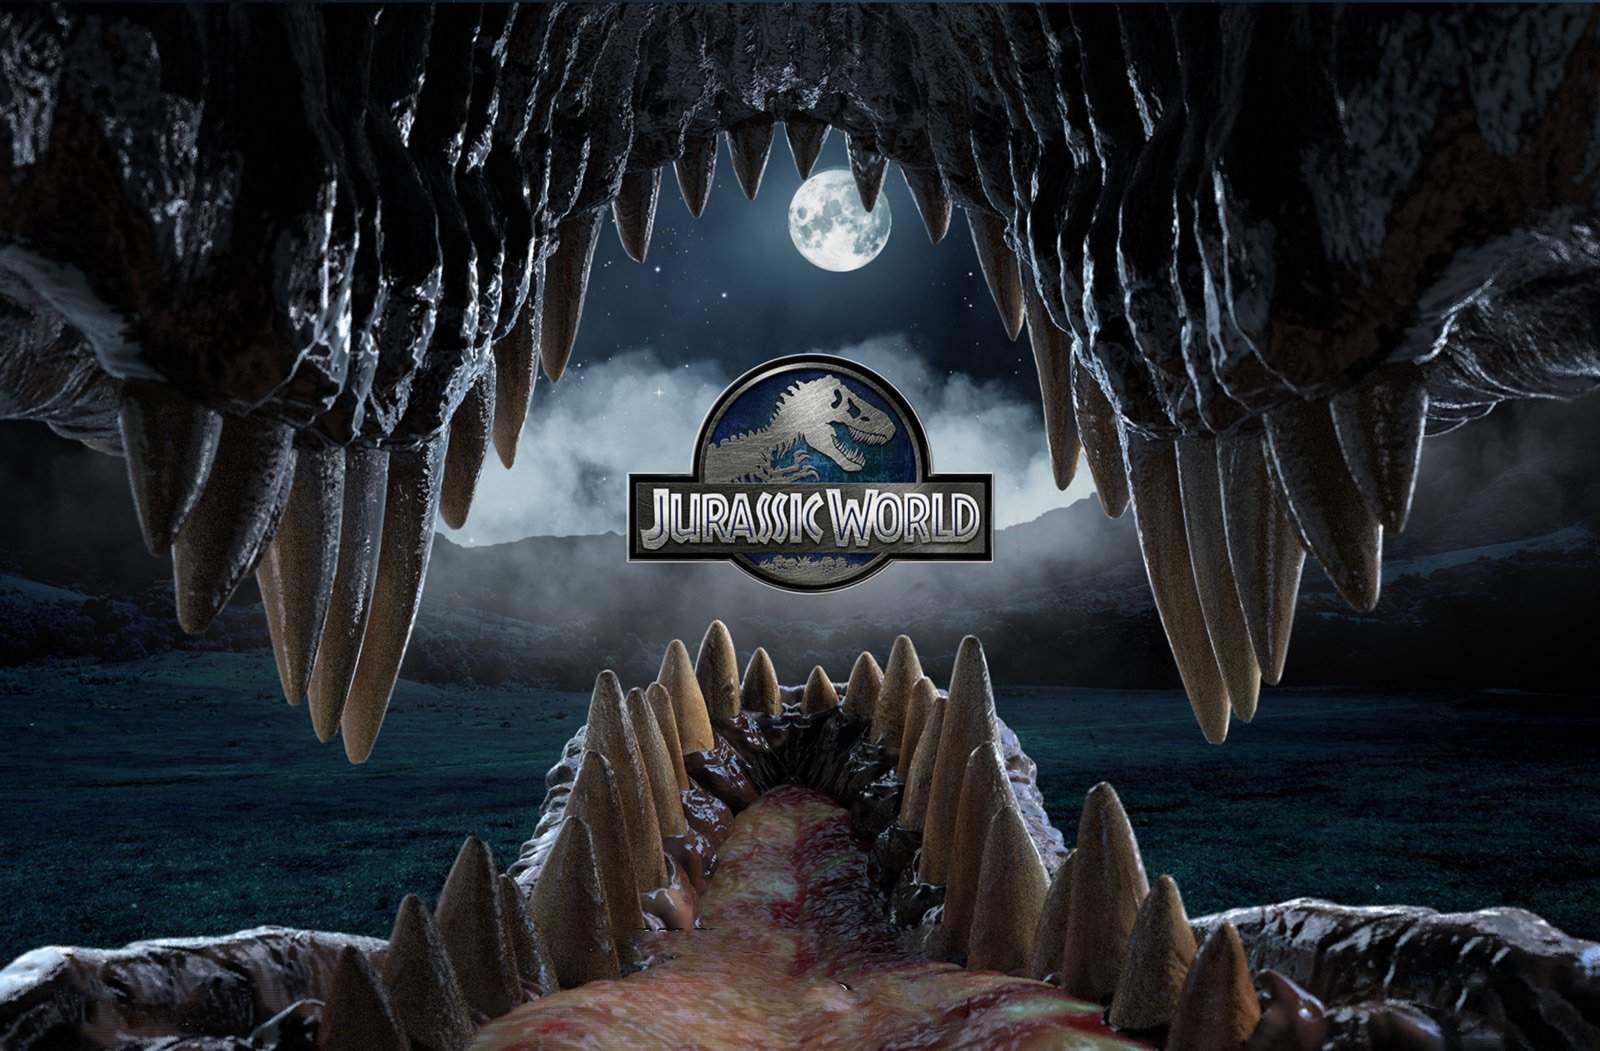 Jurassic World [Official Global Trailer]